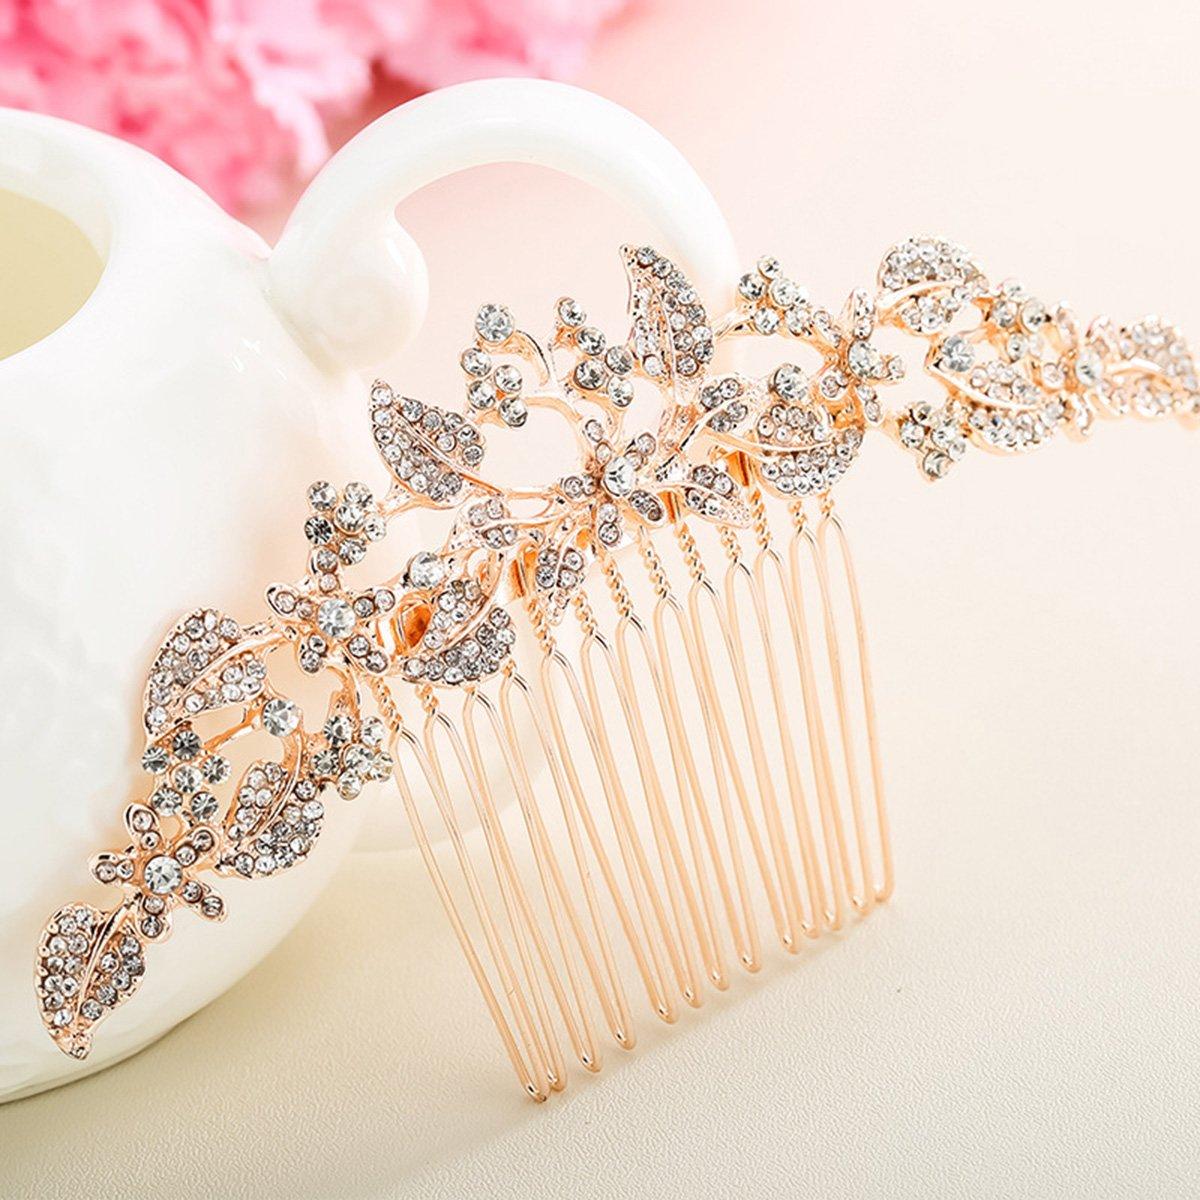 Silber Braut Hochzeit Silber Kristall Strass Perlen Frauen Haar Kamm